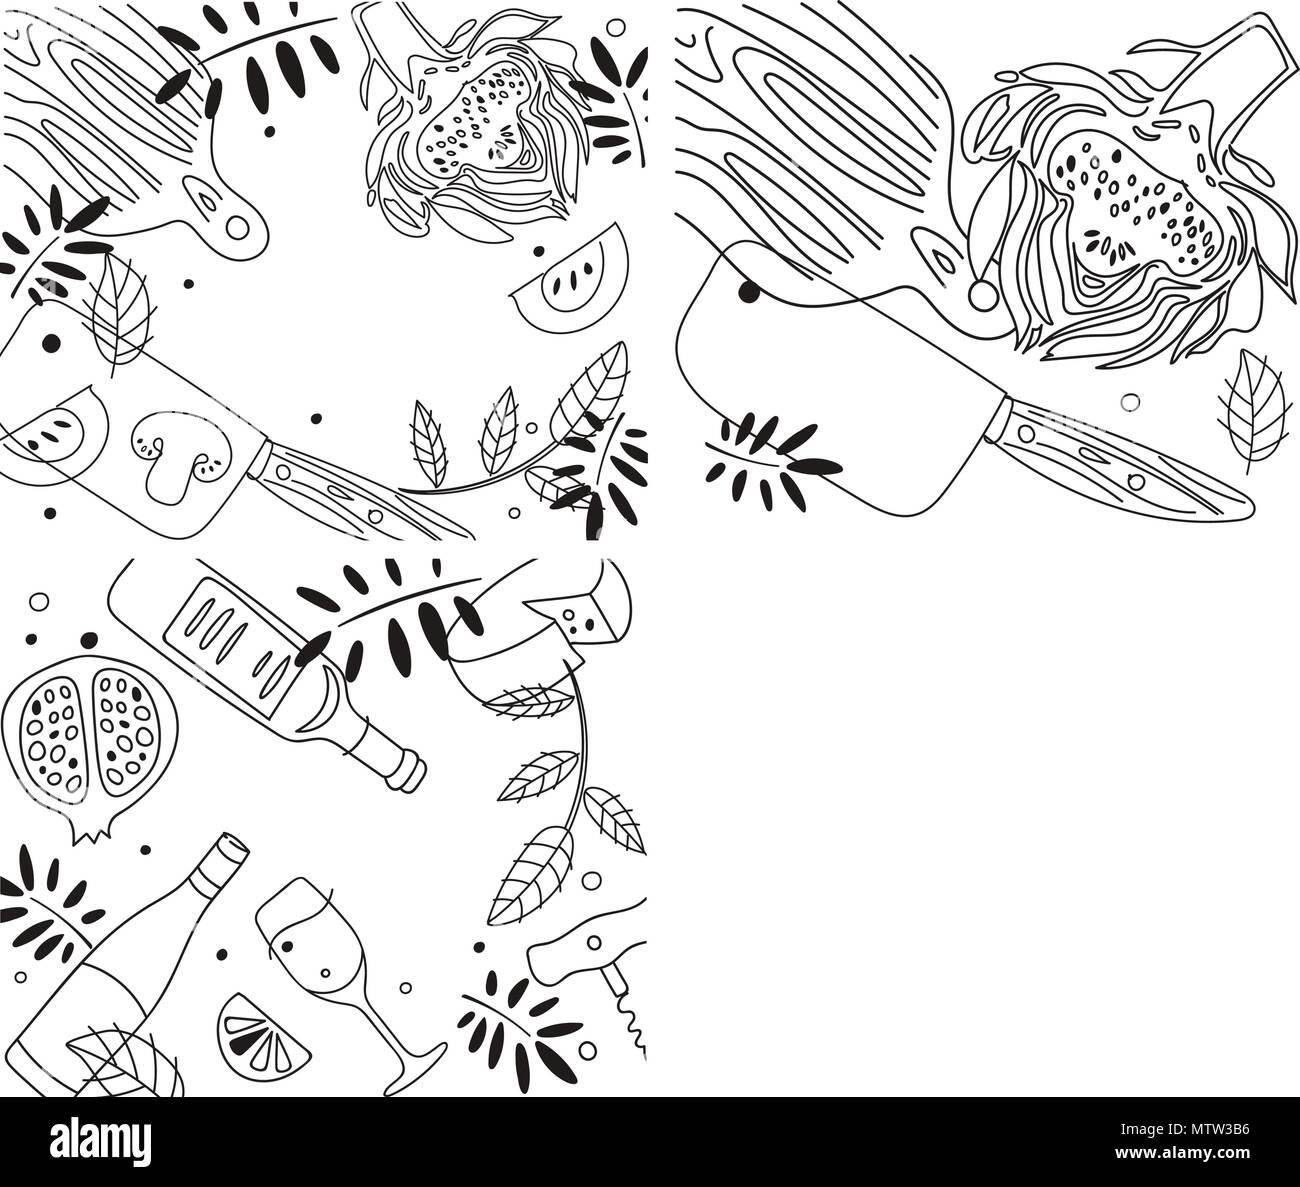 Kitchen Composition. Line Art Graphic. Restaurant Template